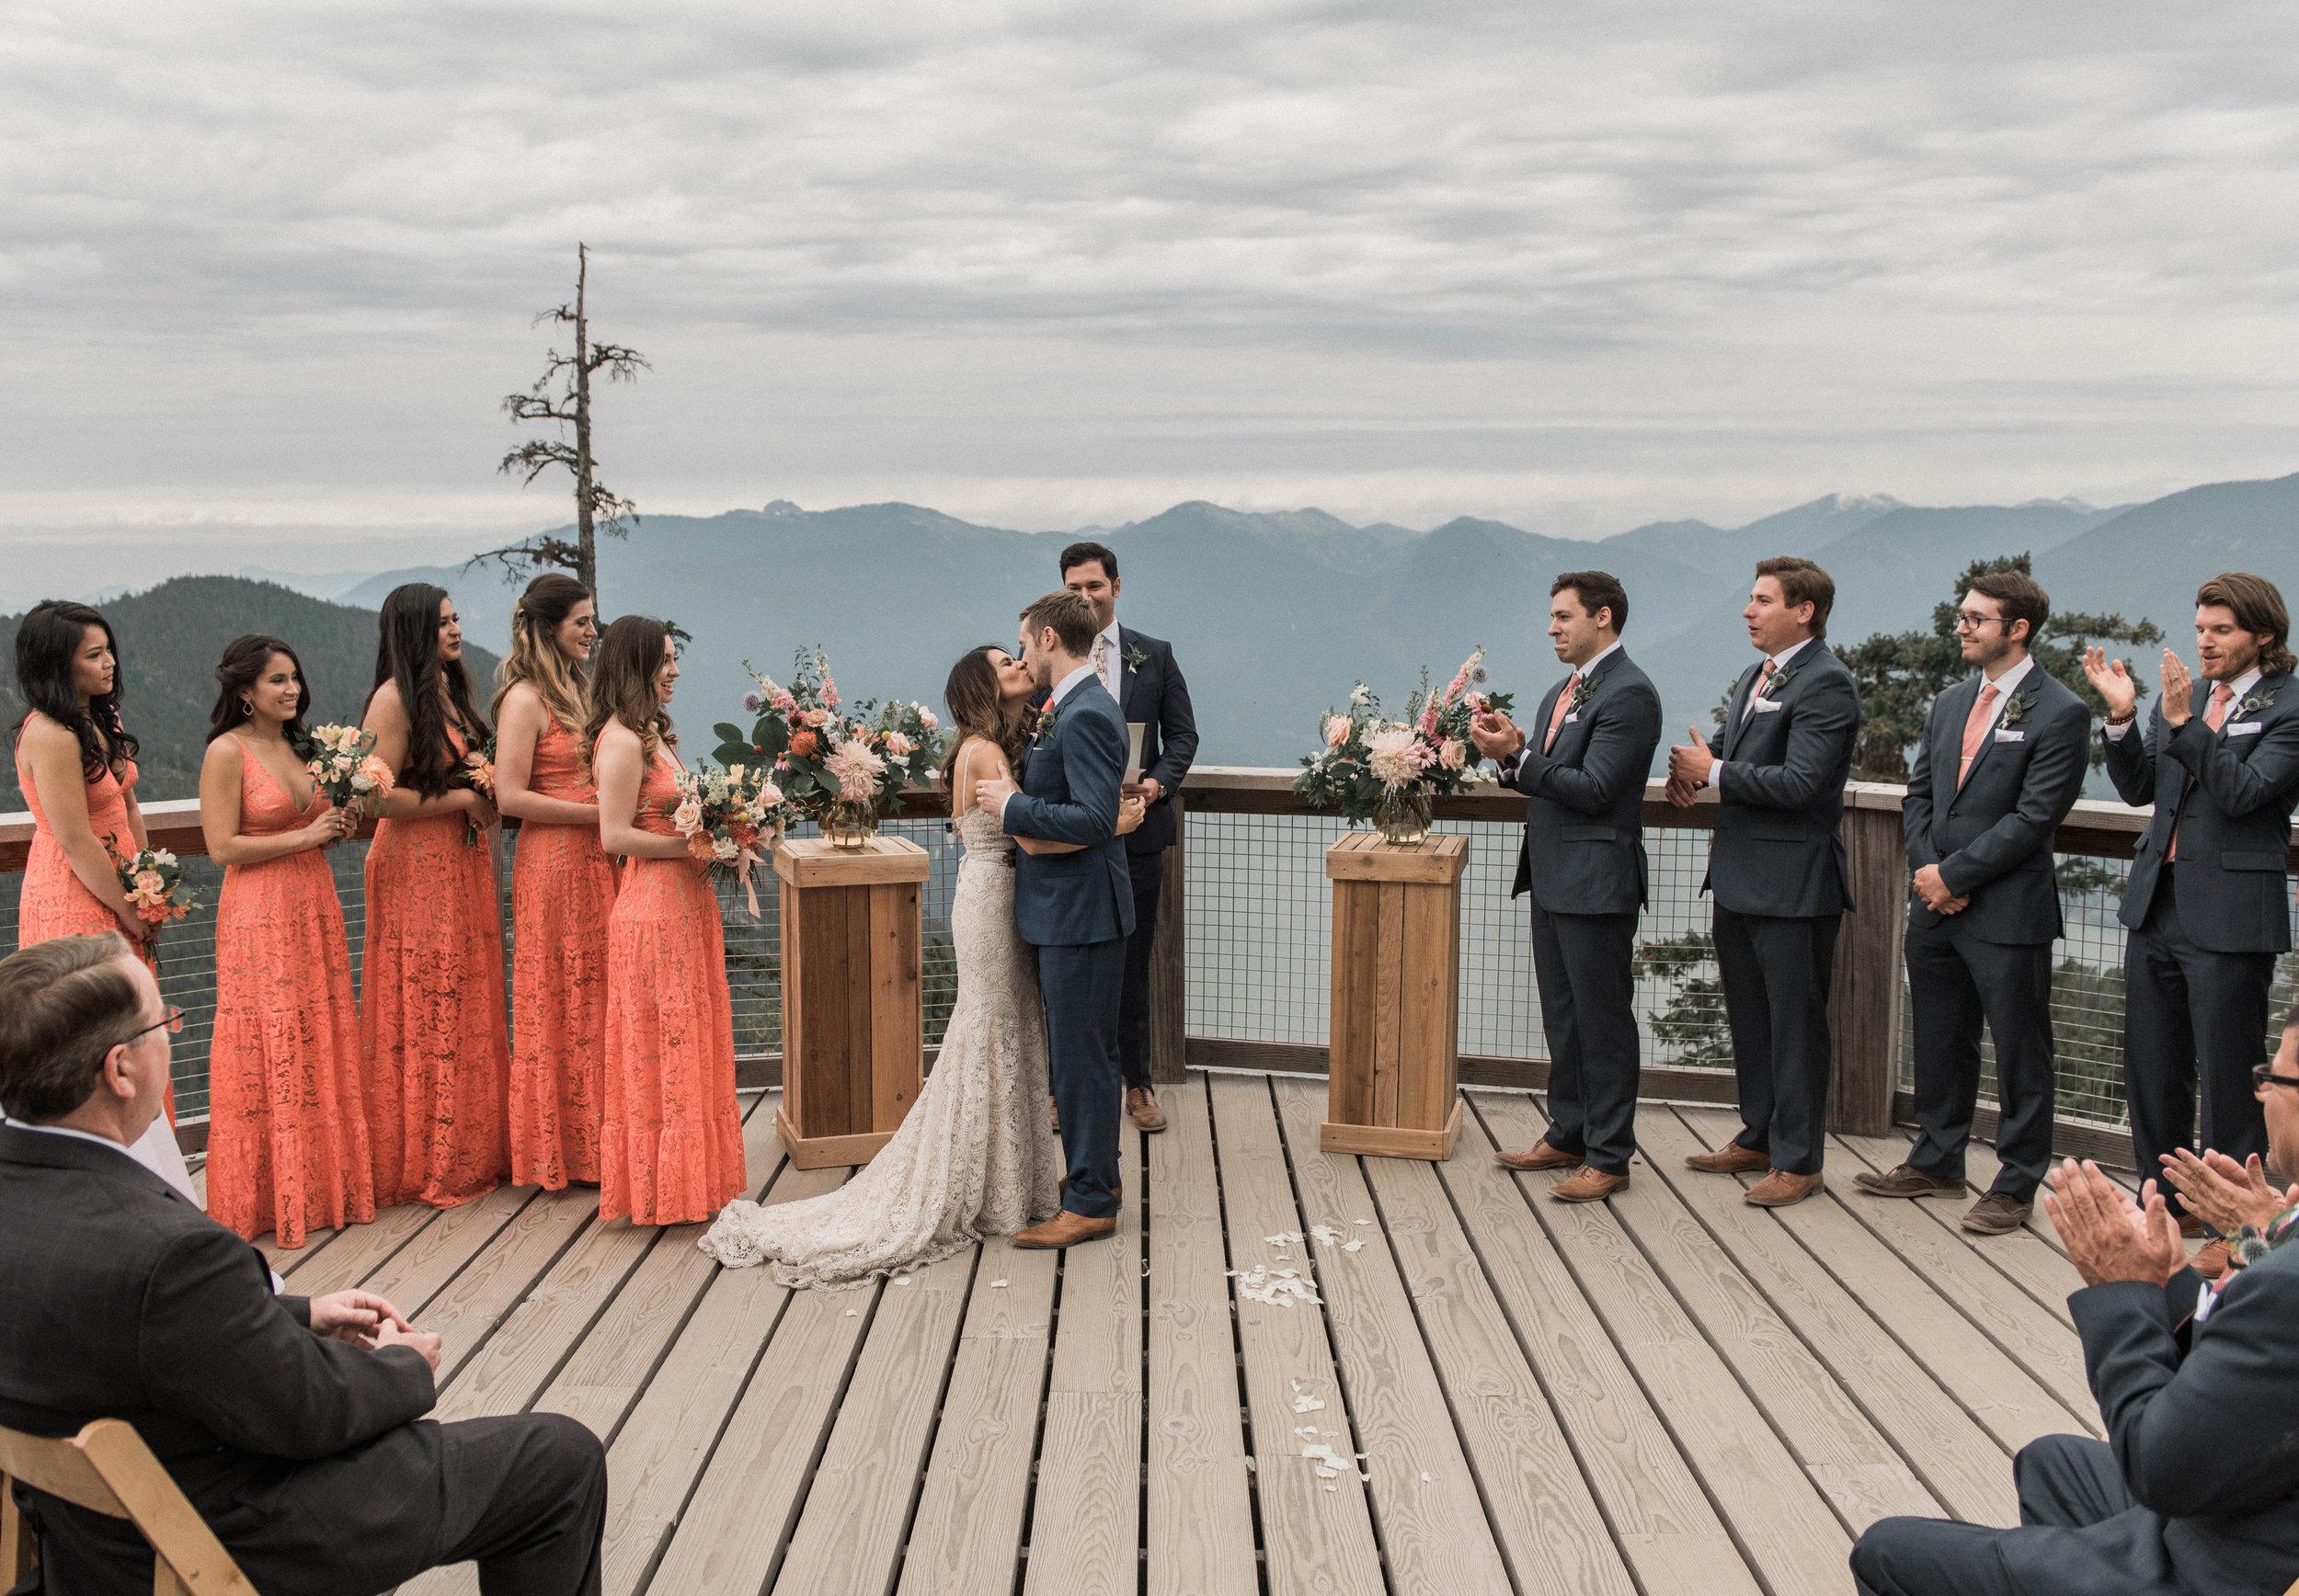 austin-texas-wedding-photography-1778-photographie-93.jpg